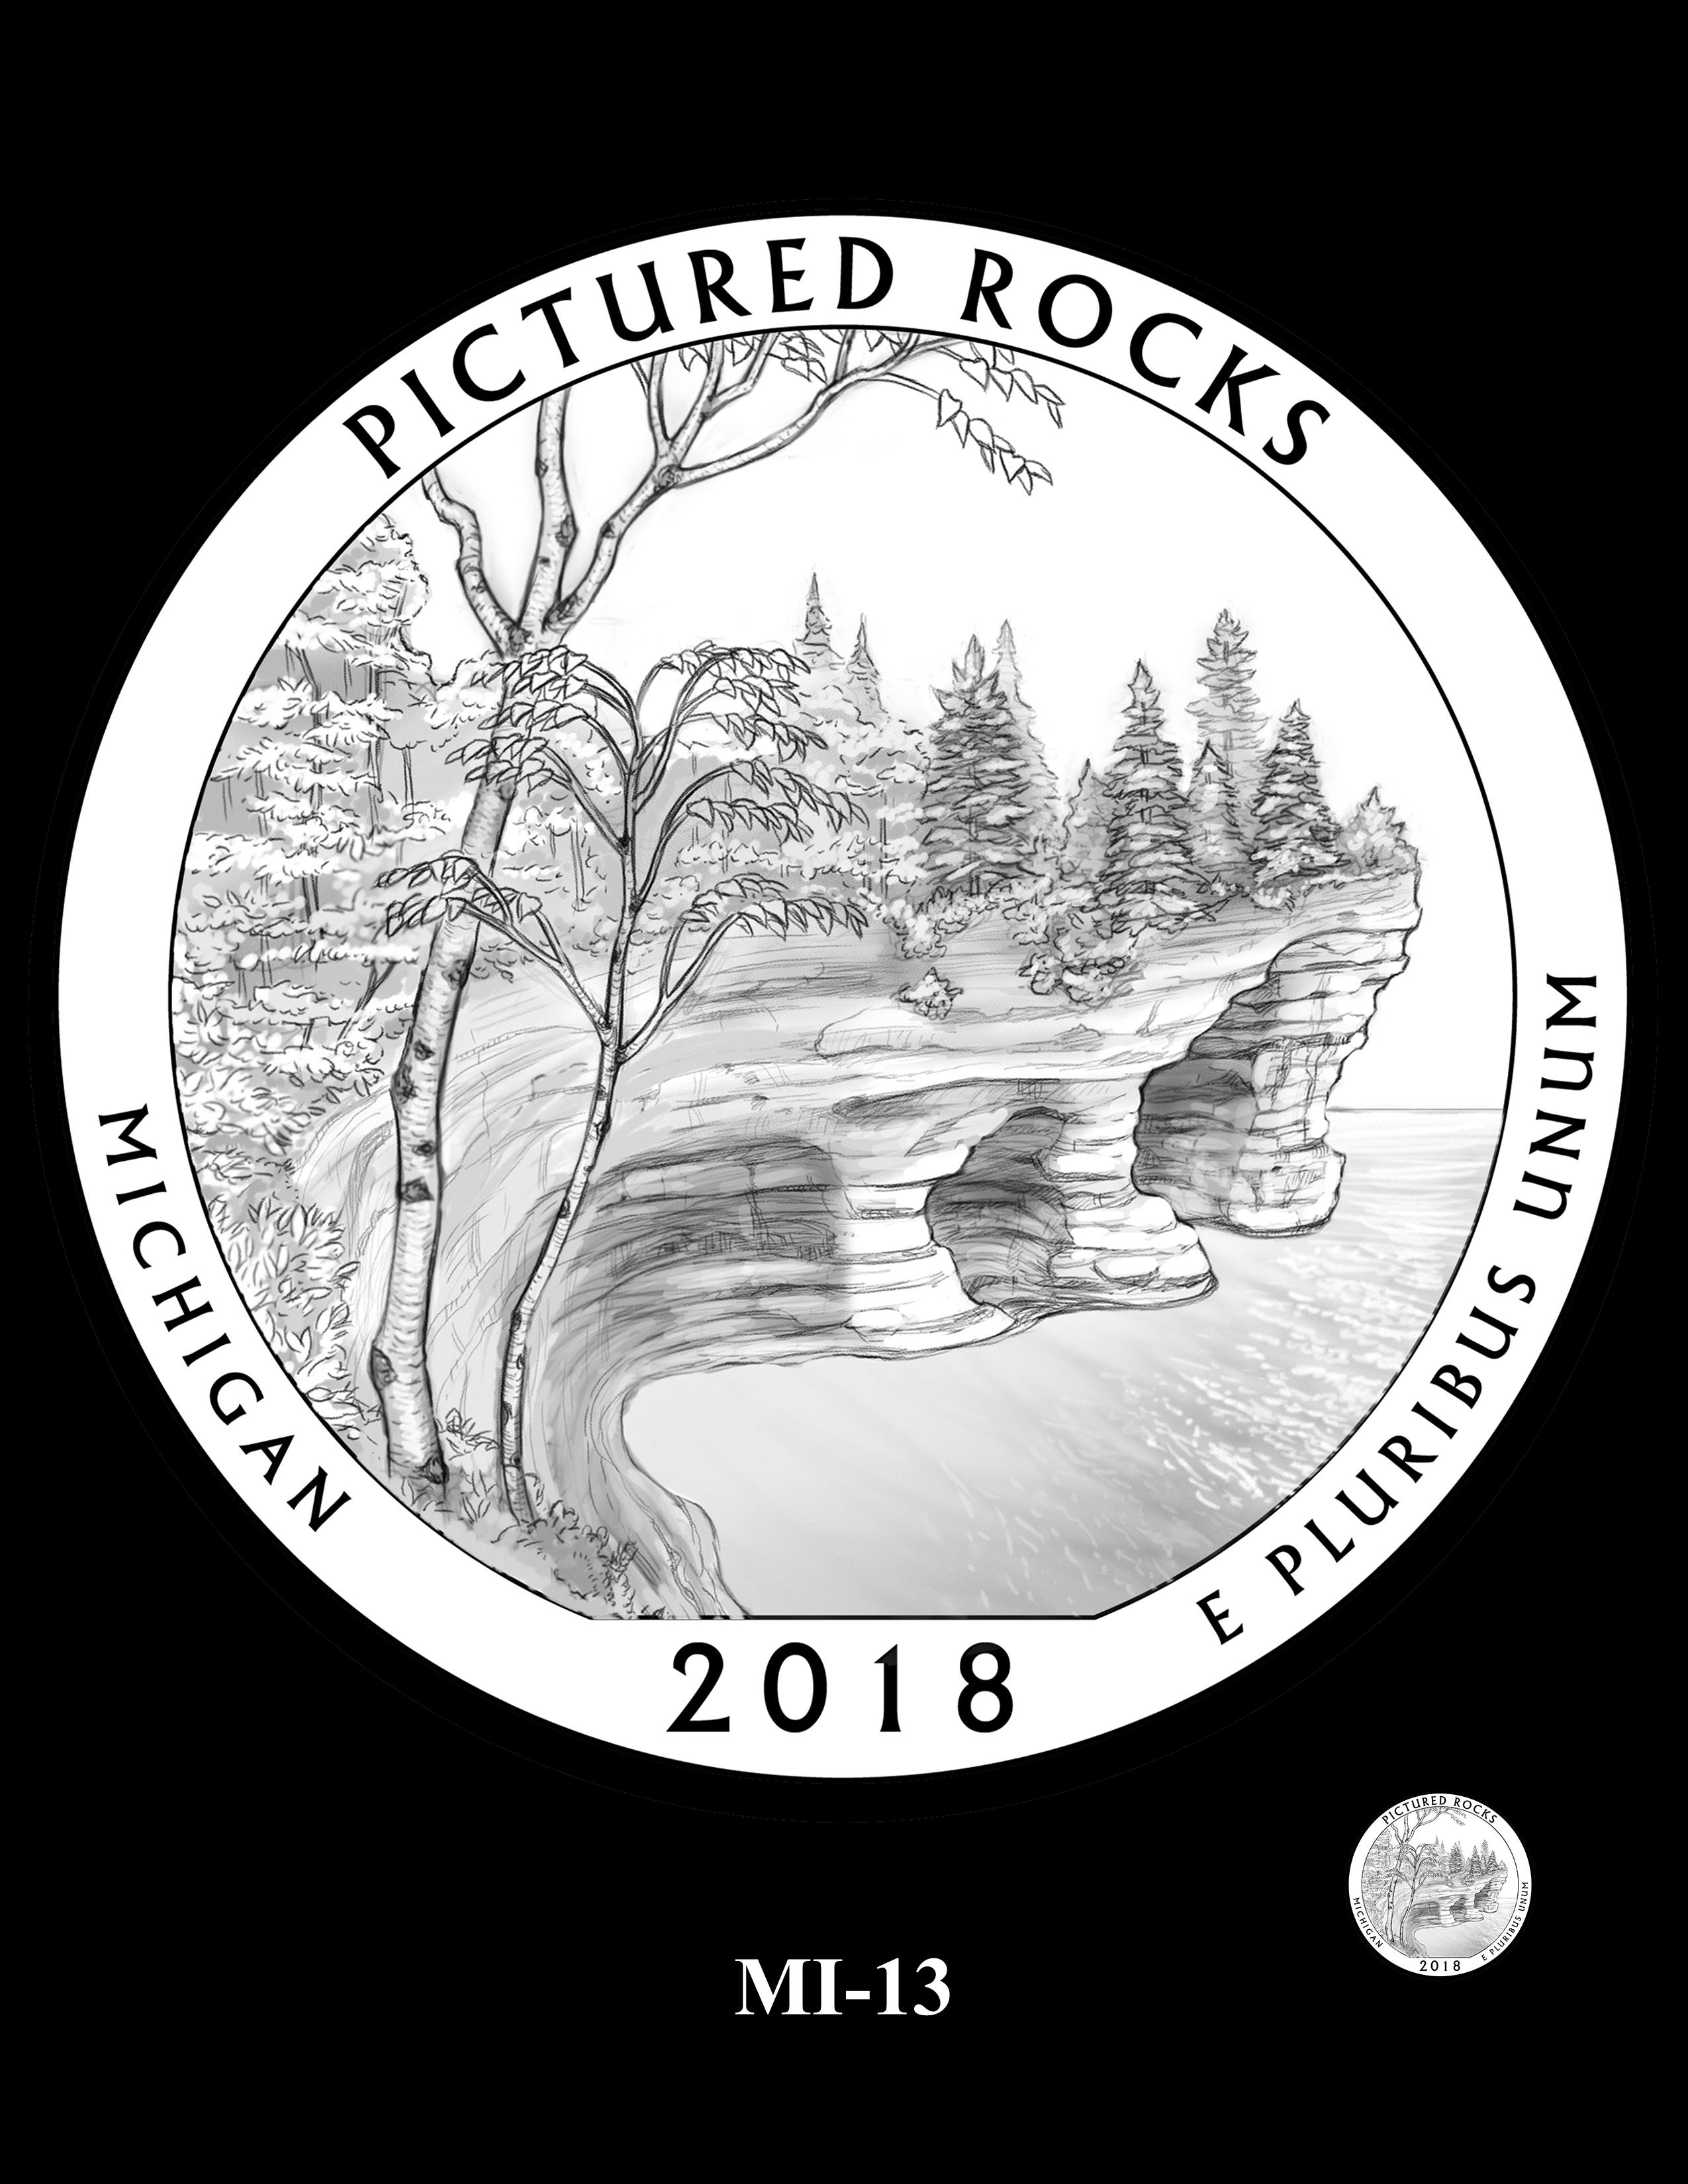 MI-13 -- 2018 America the Beautiful® Quarters Program